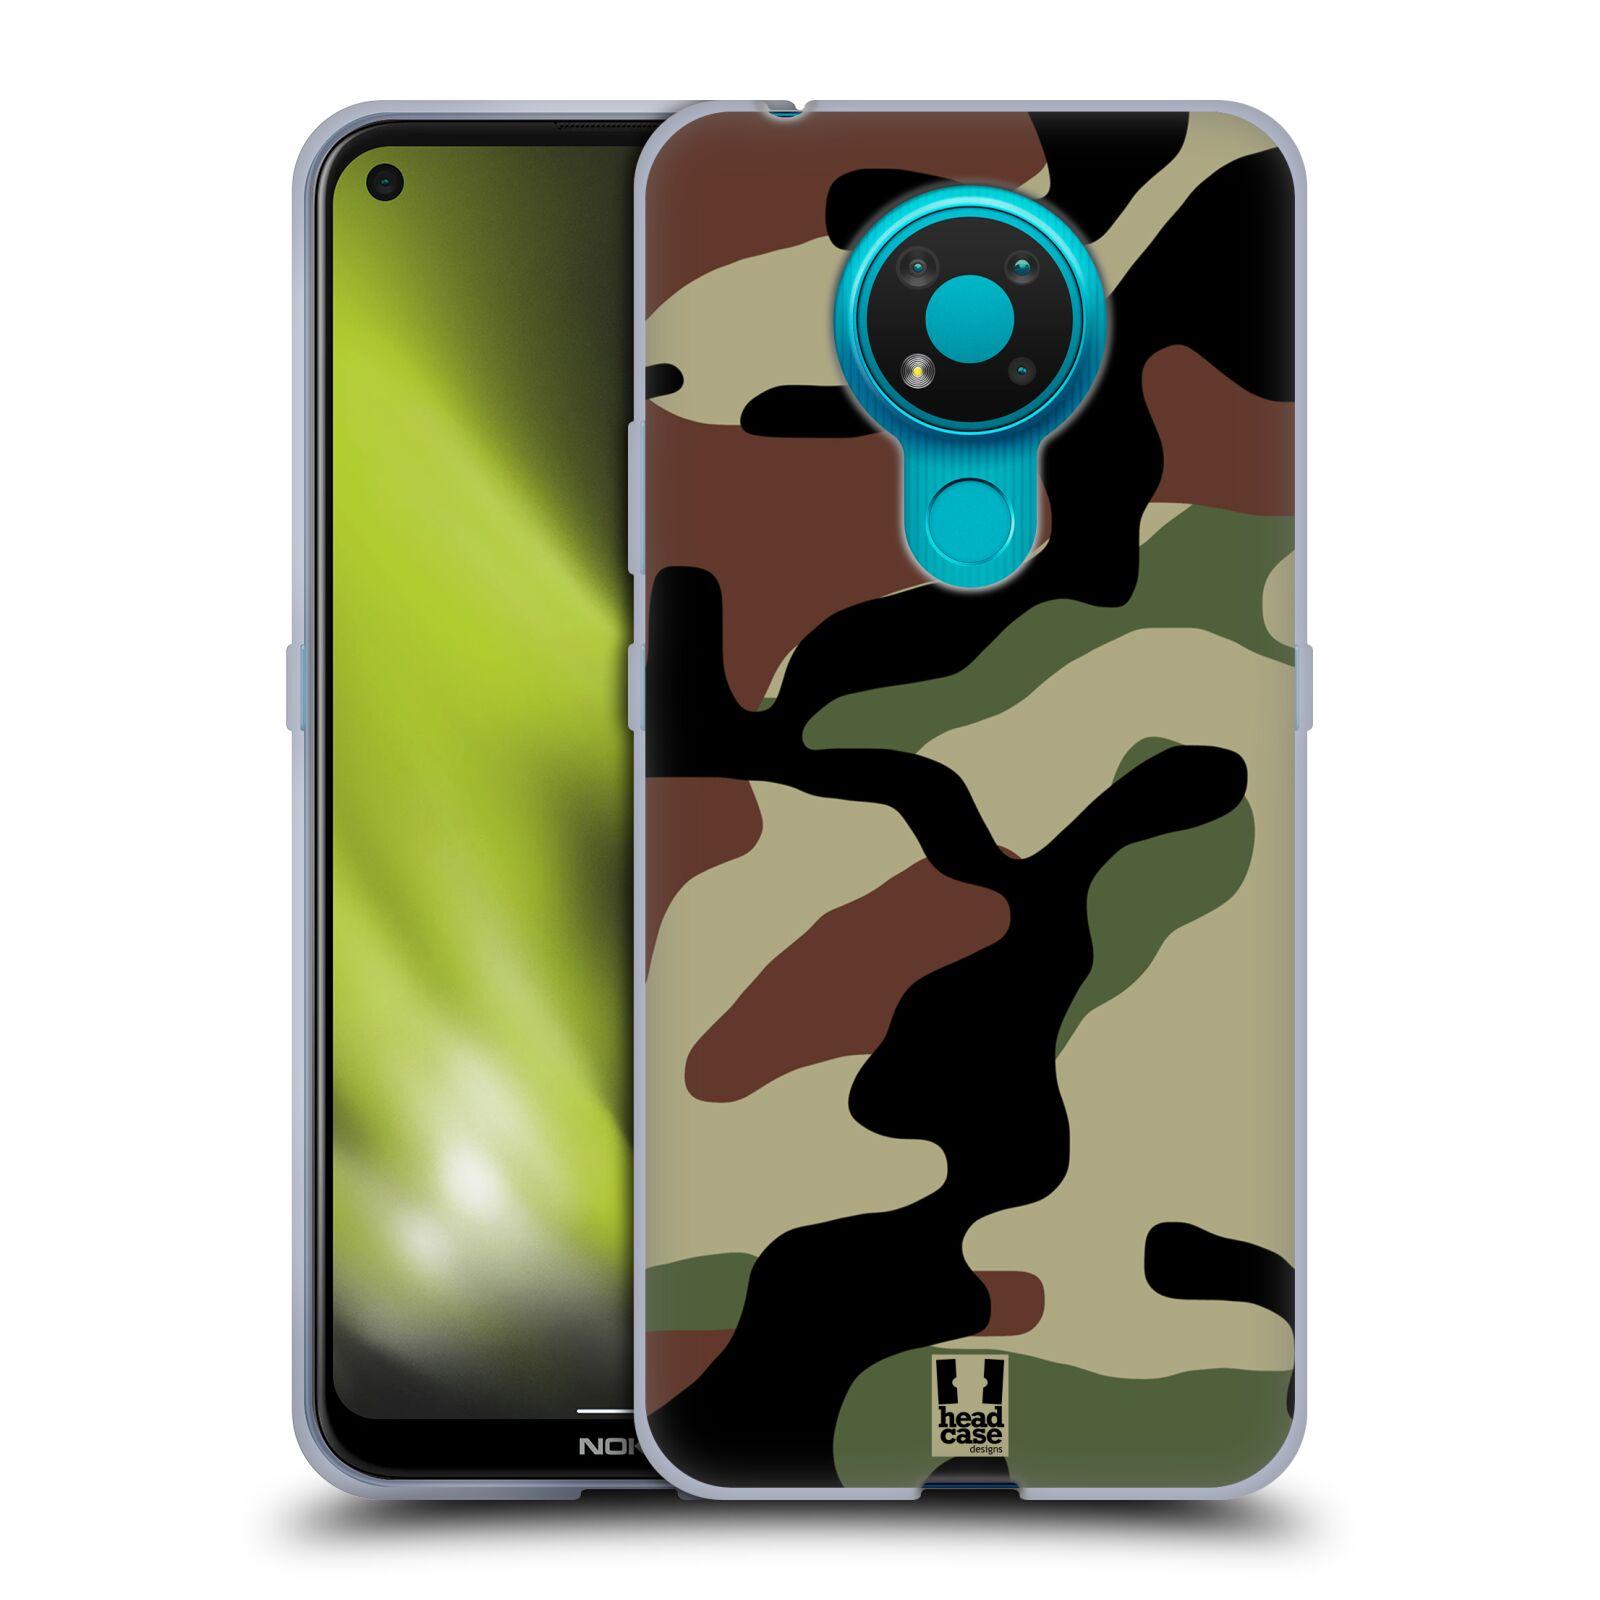 Silikonové pouzdro na mobil Nokia 3.4 - Head Case - Maskáče